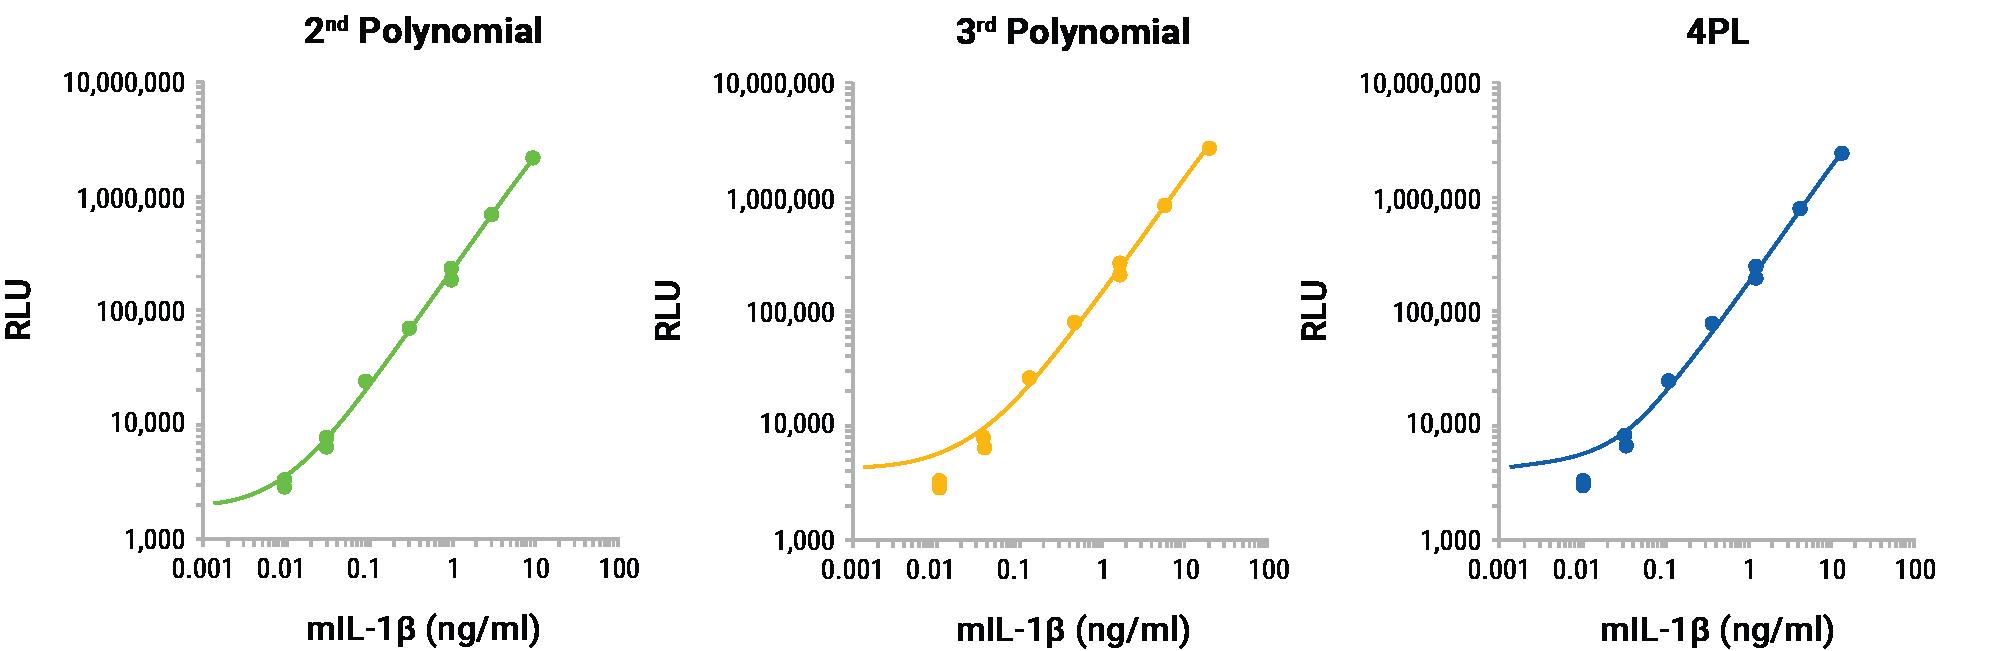 lumit mouse il-1b calibration standards polynomial nonlinear regression